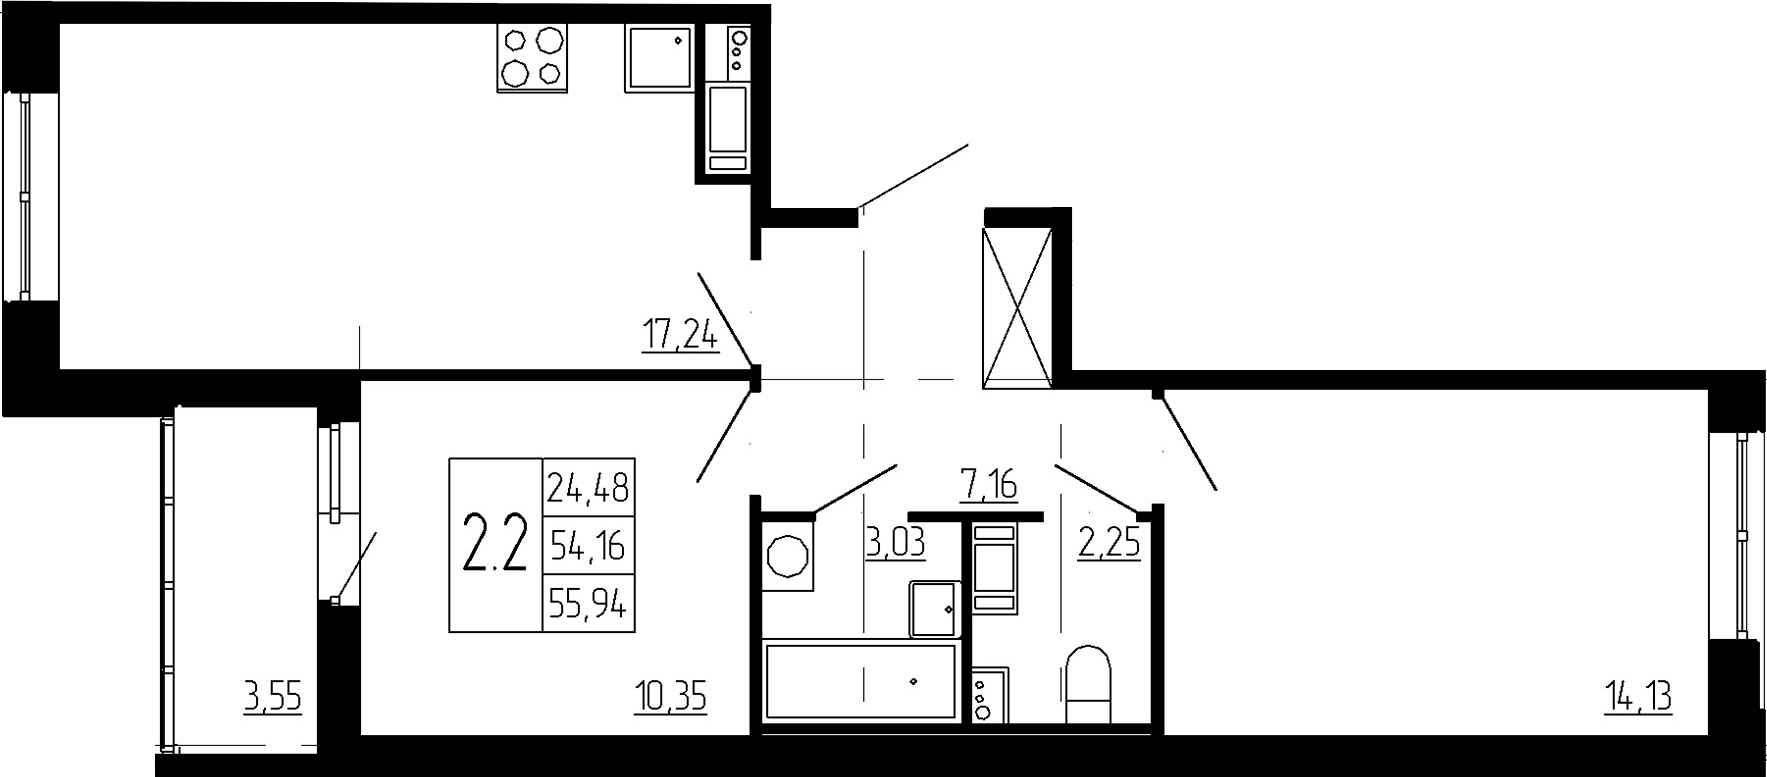 3Е-к.кв, 54.16 м²